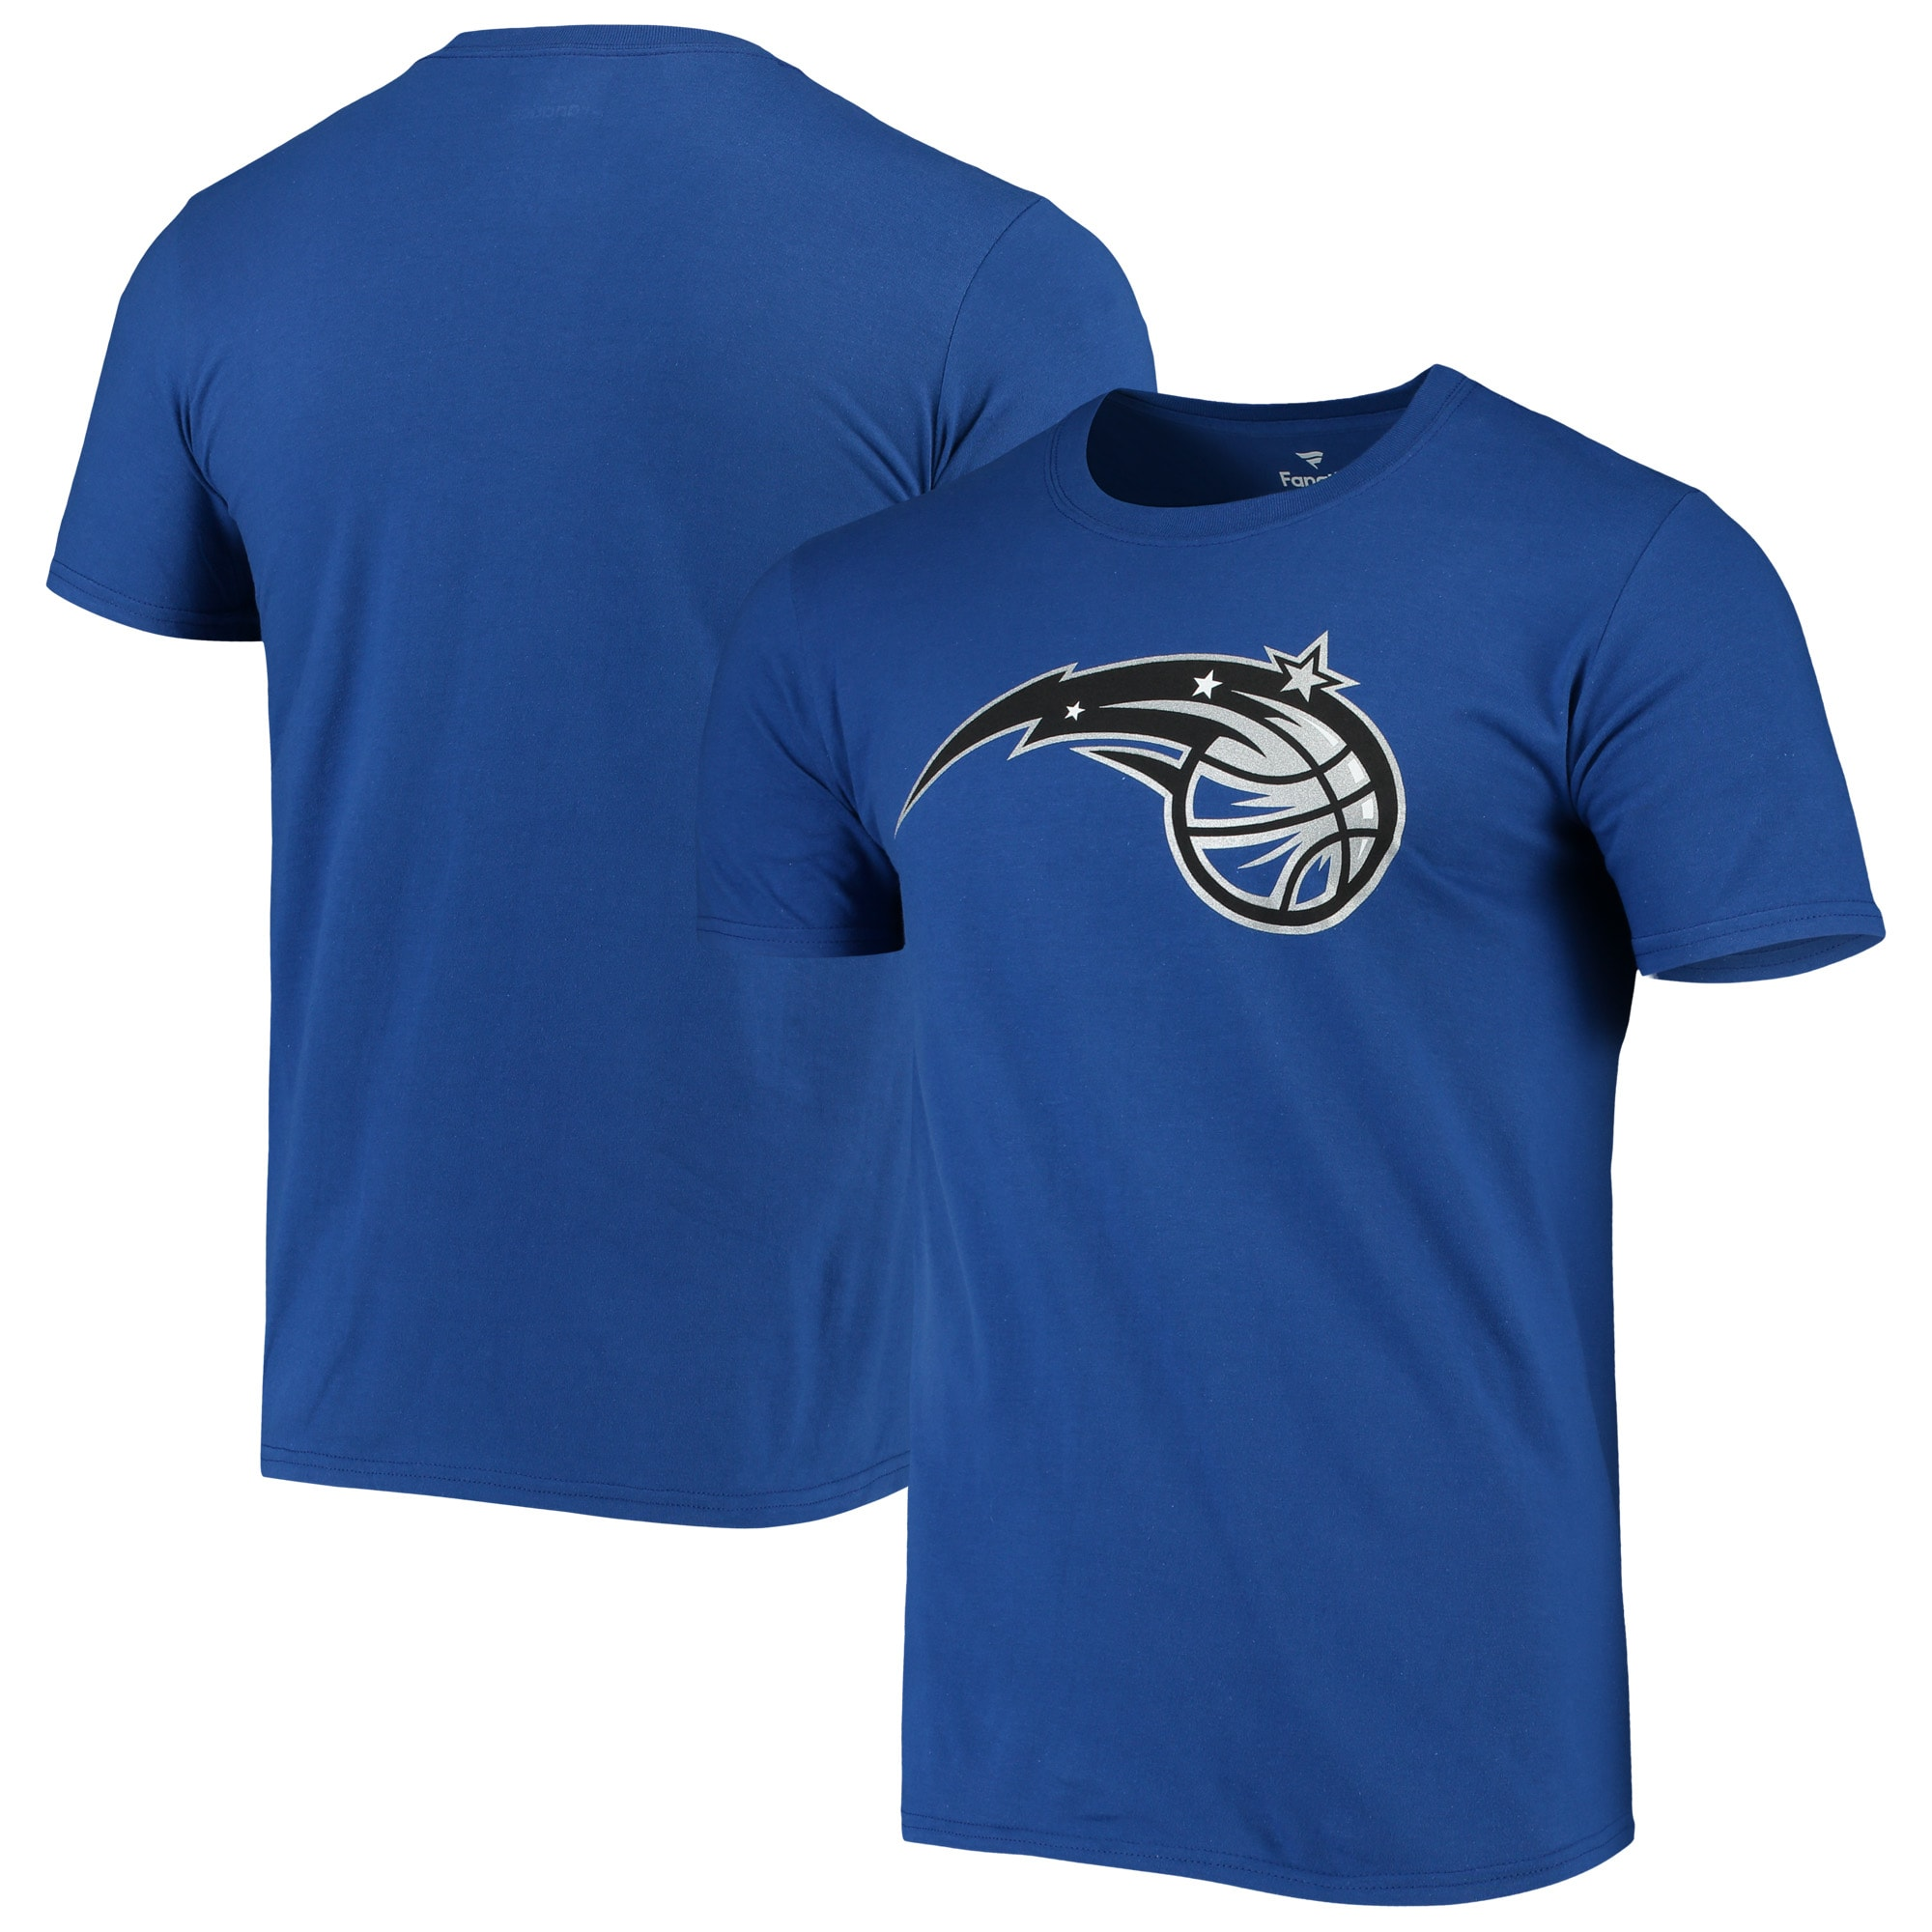 Orlando Magic Fanatics Branded Primary Team Logo T-Shirt - Blue